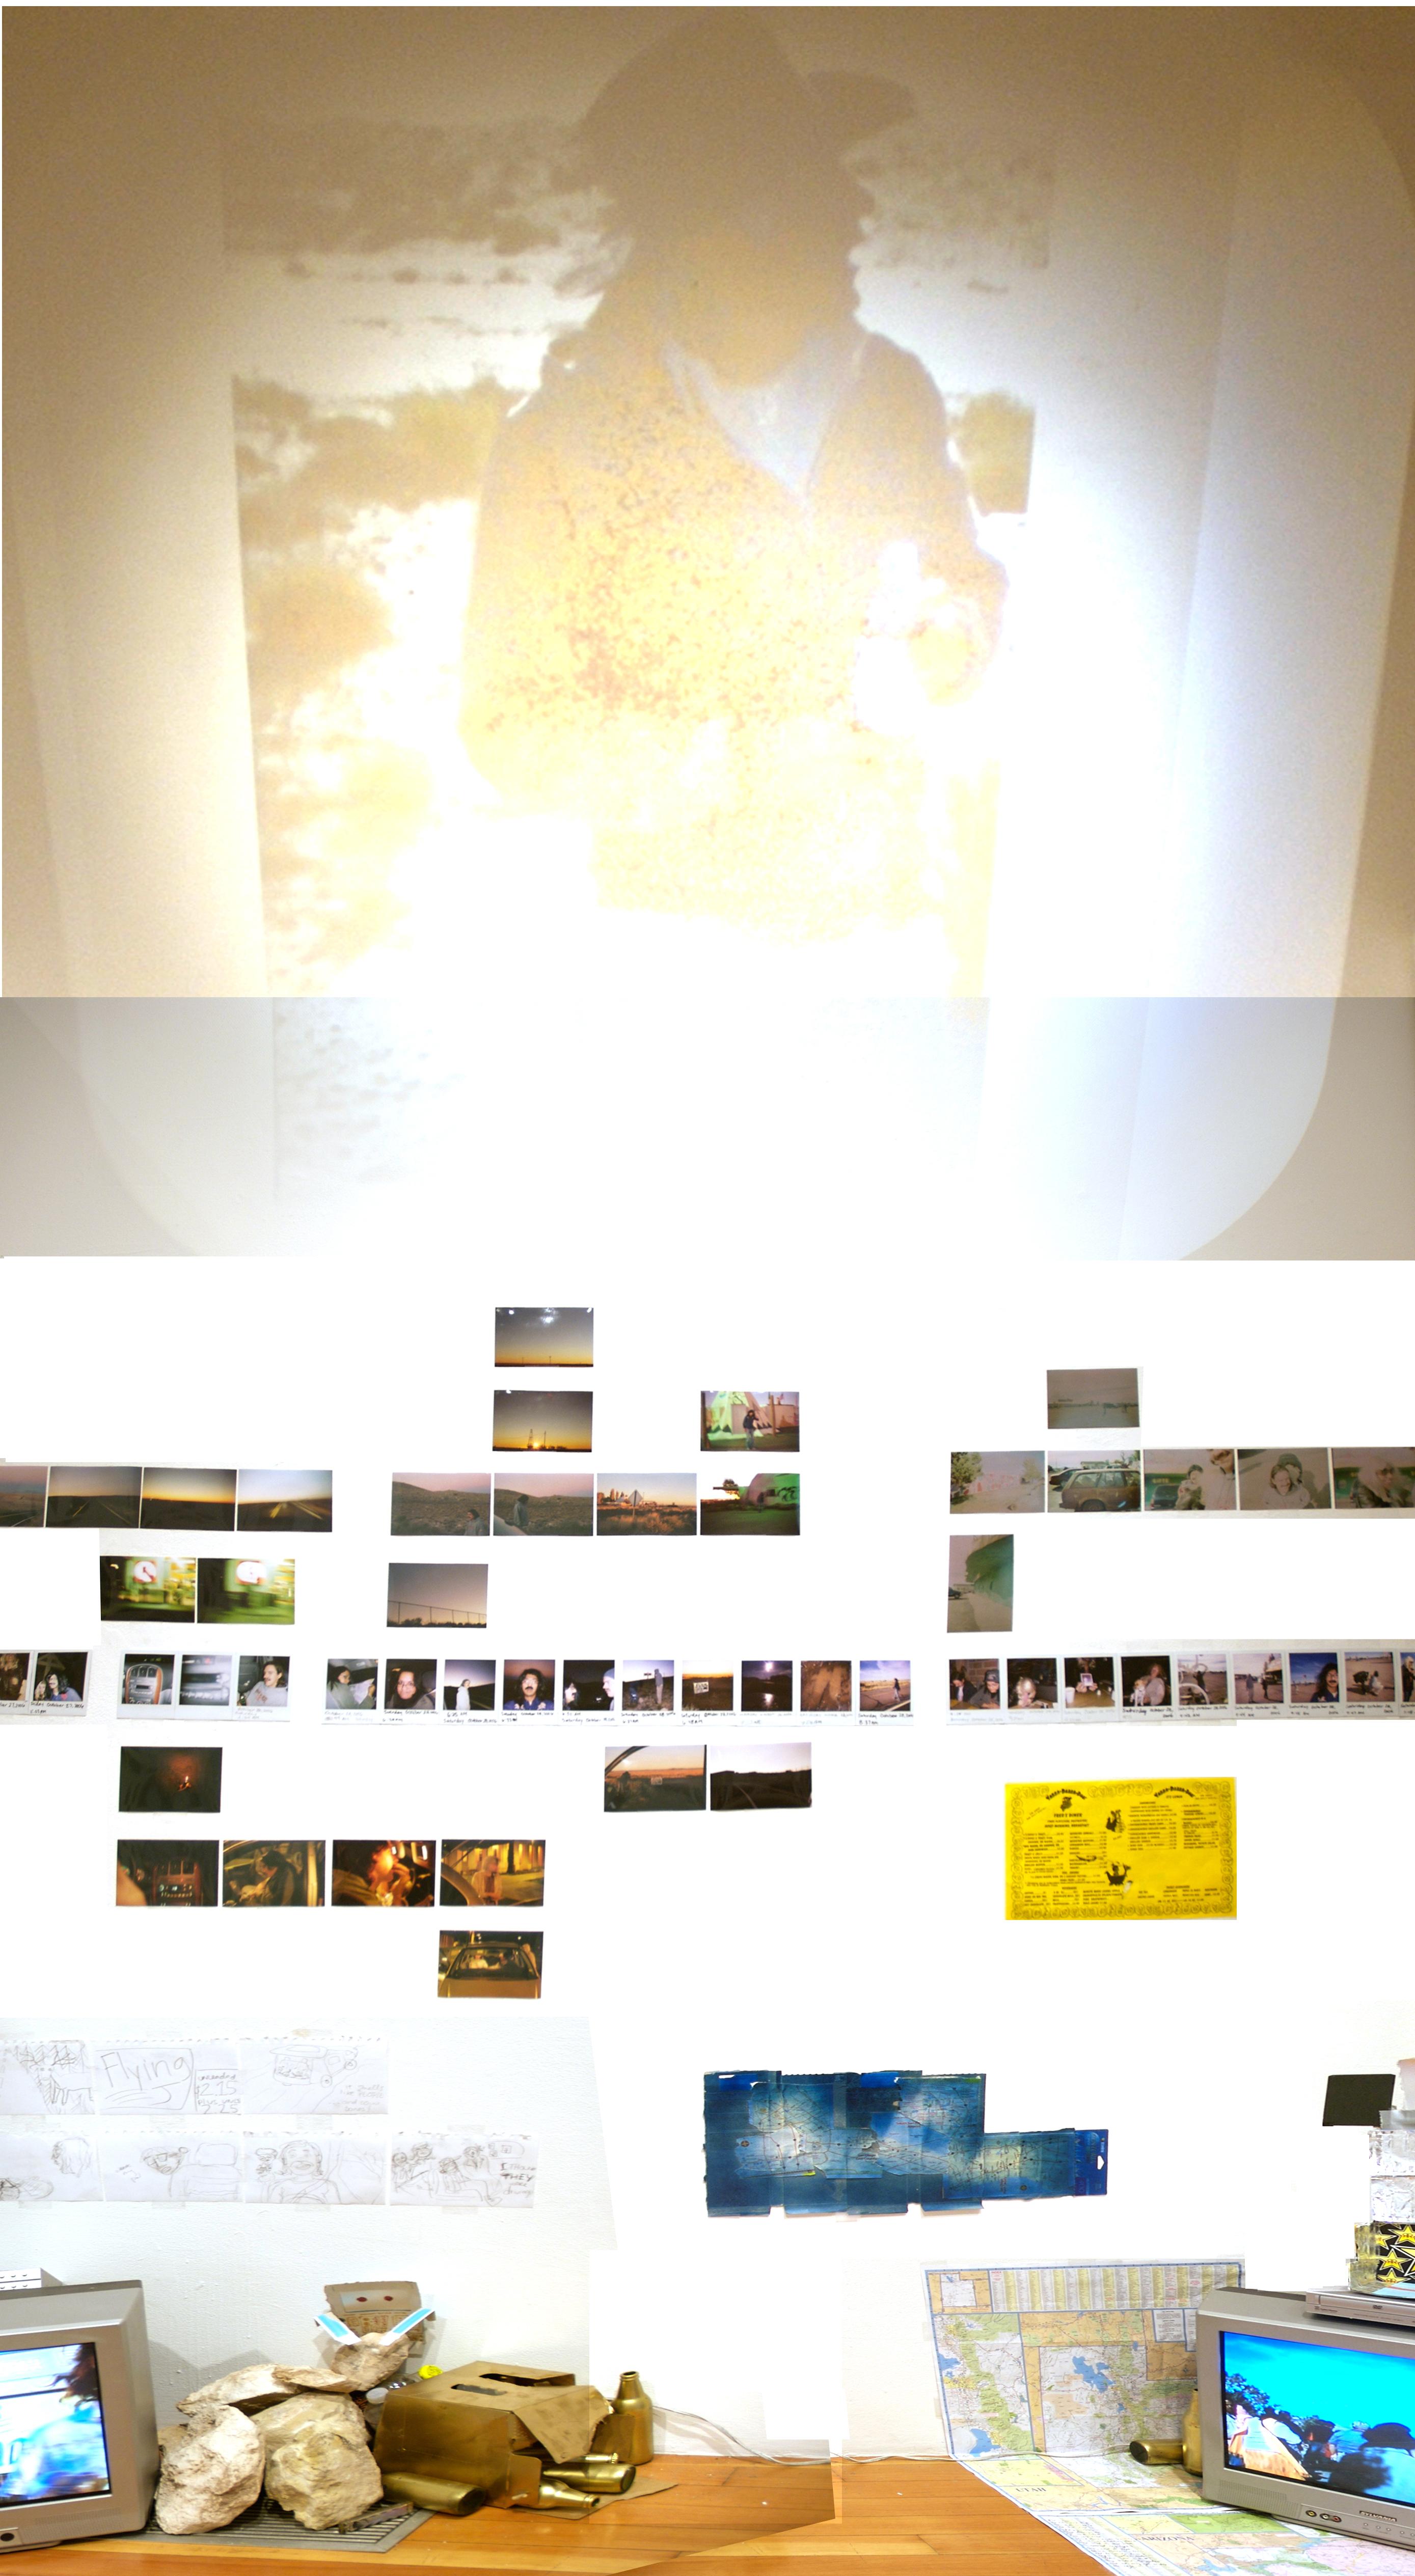 3 -  tempe, wall 2.jpg